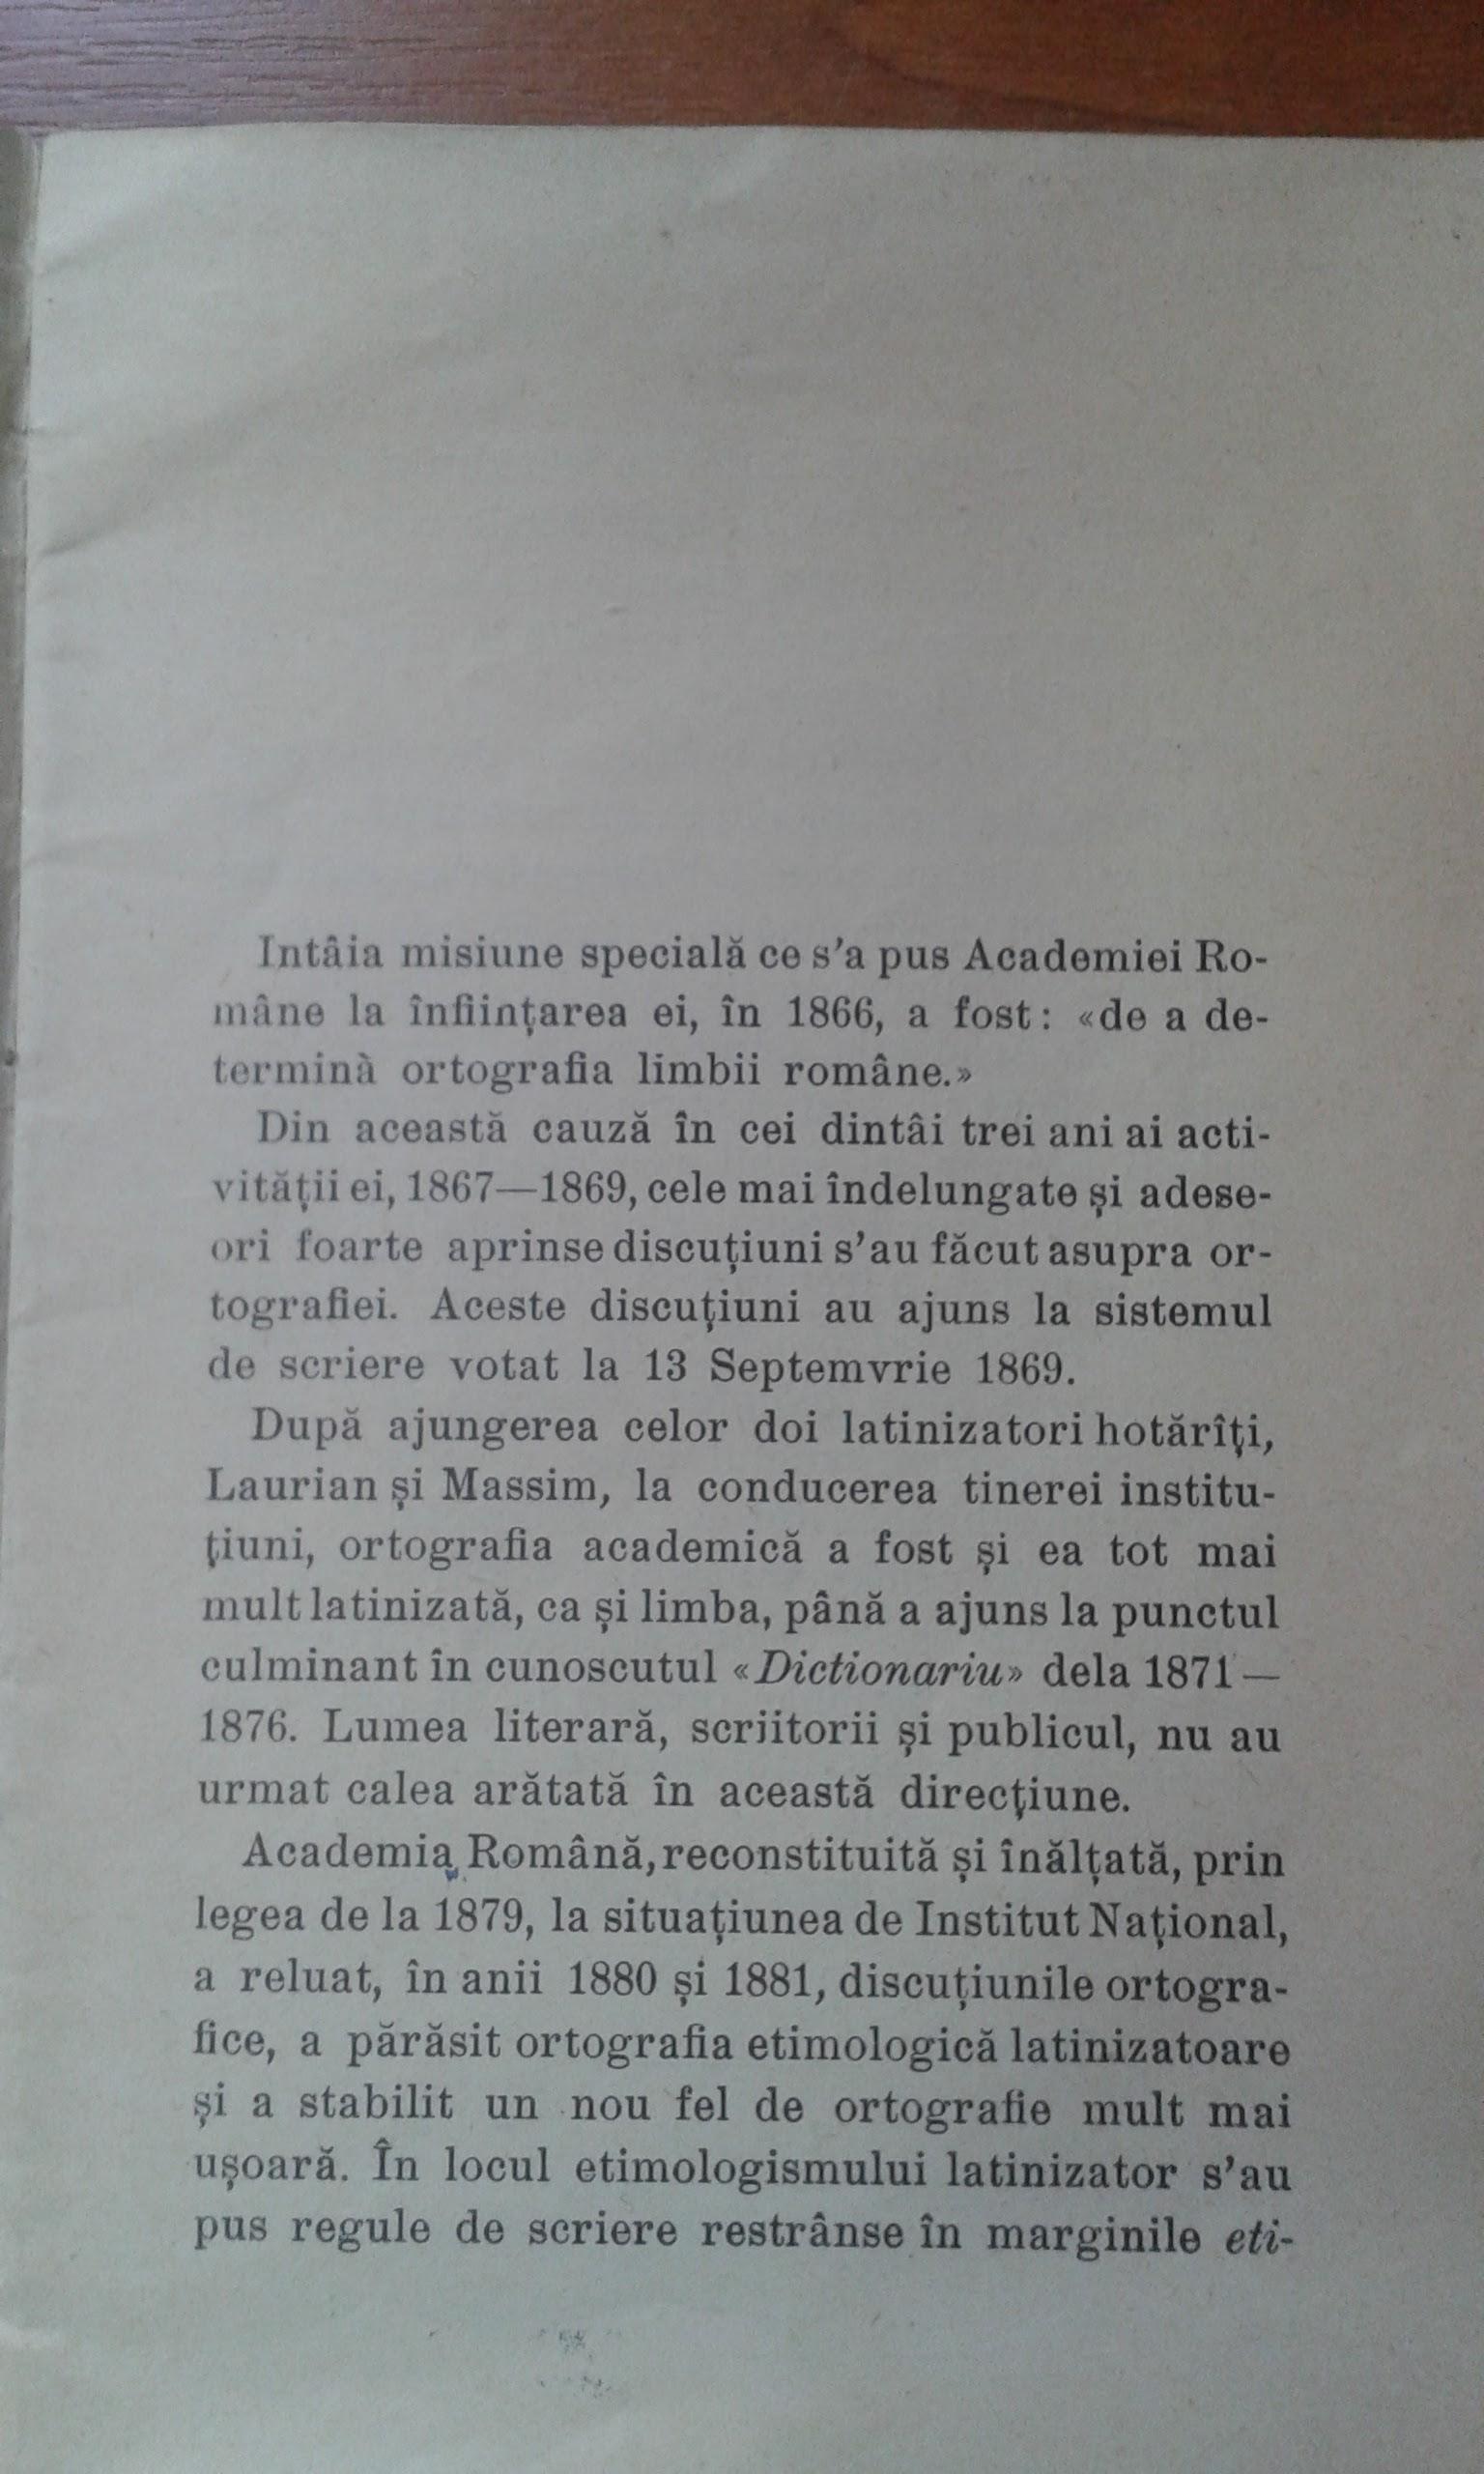 1904 - Regule ortografice (3).jpg